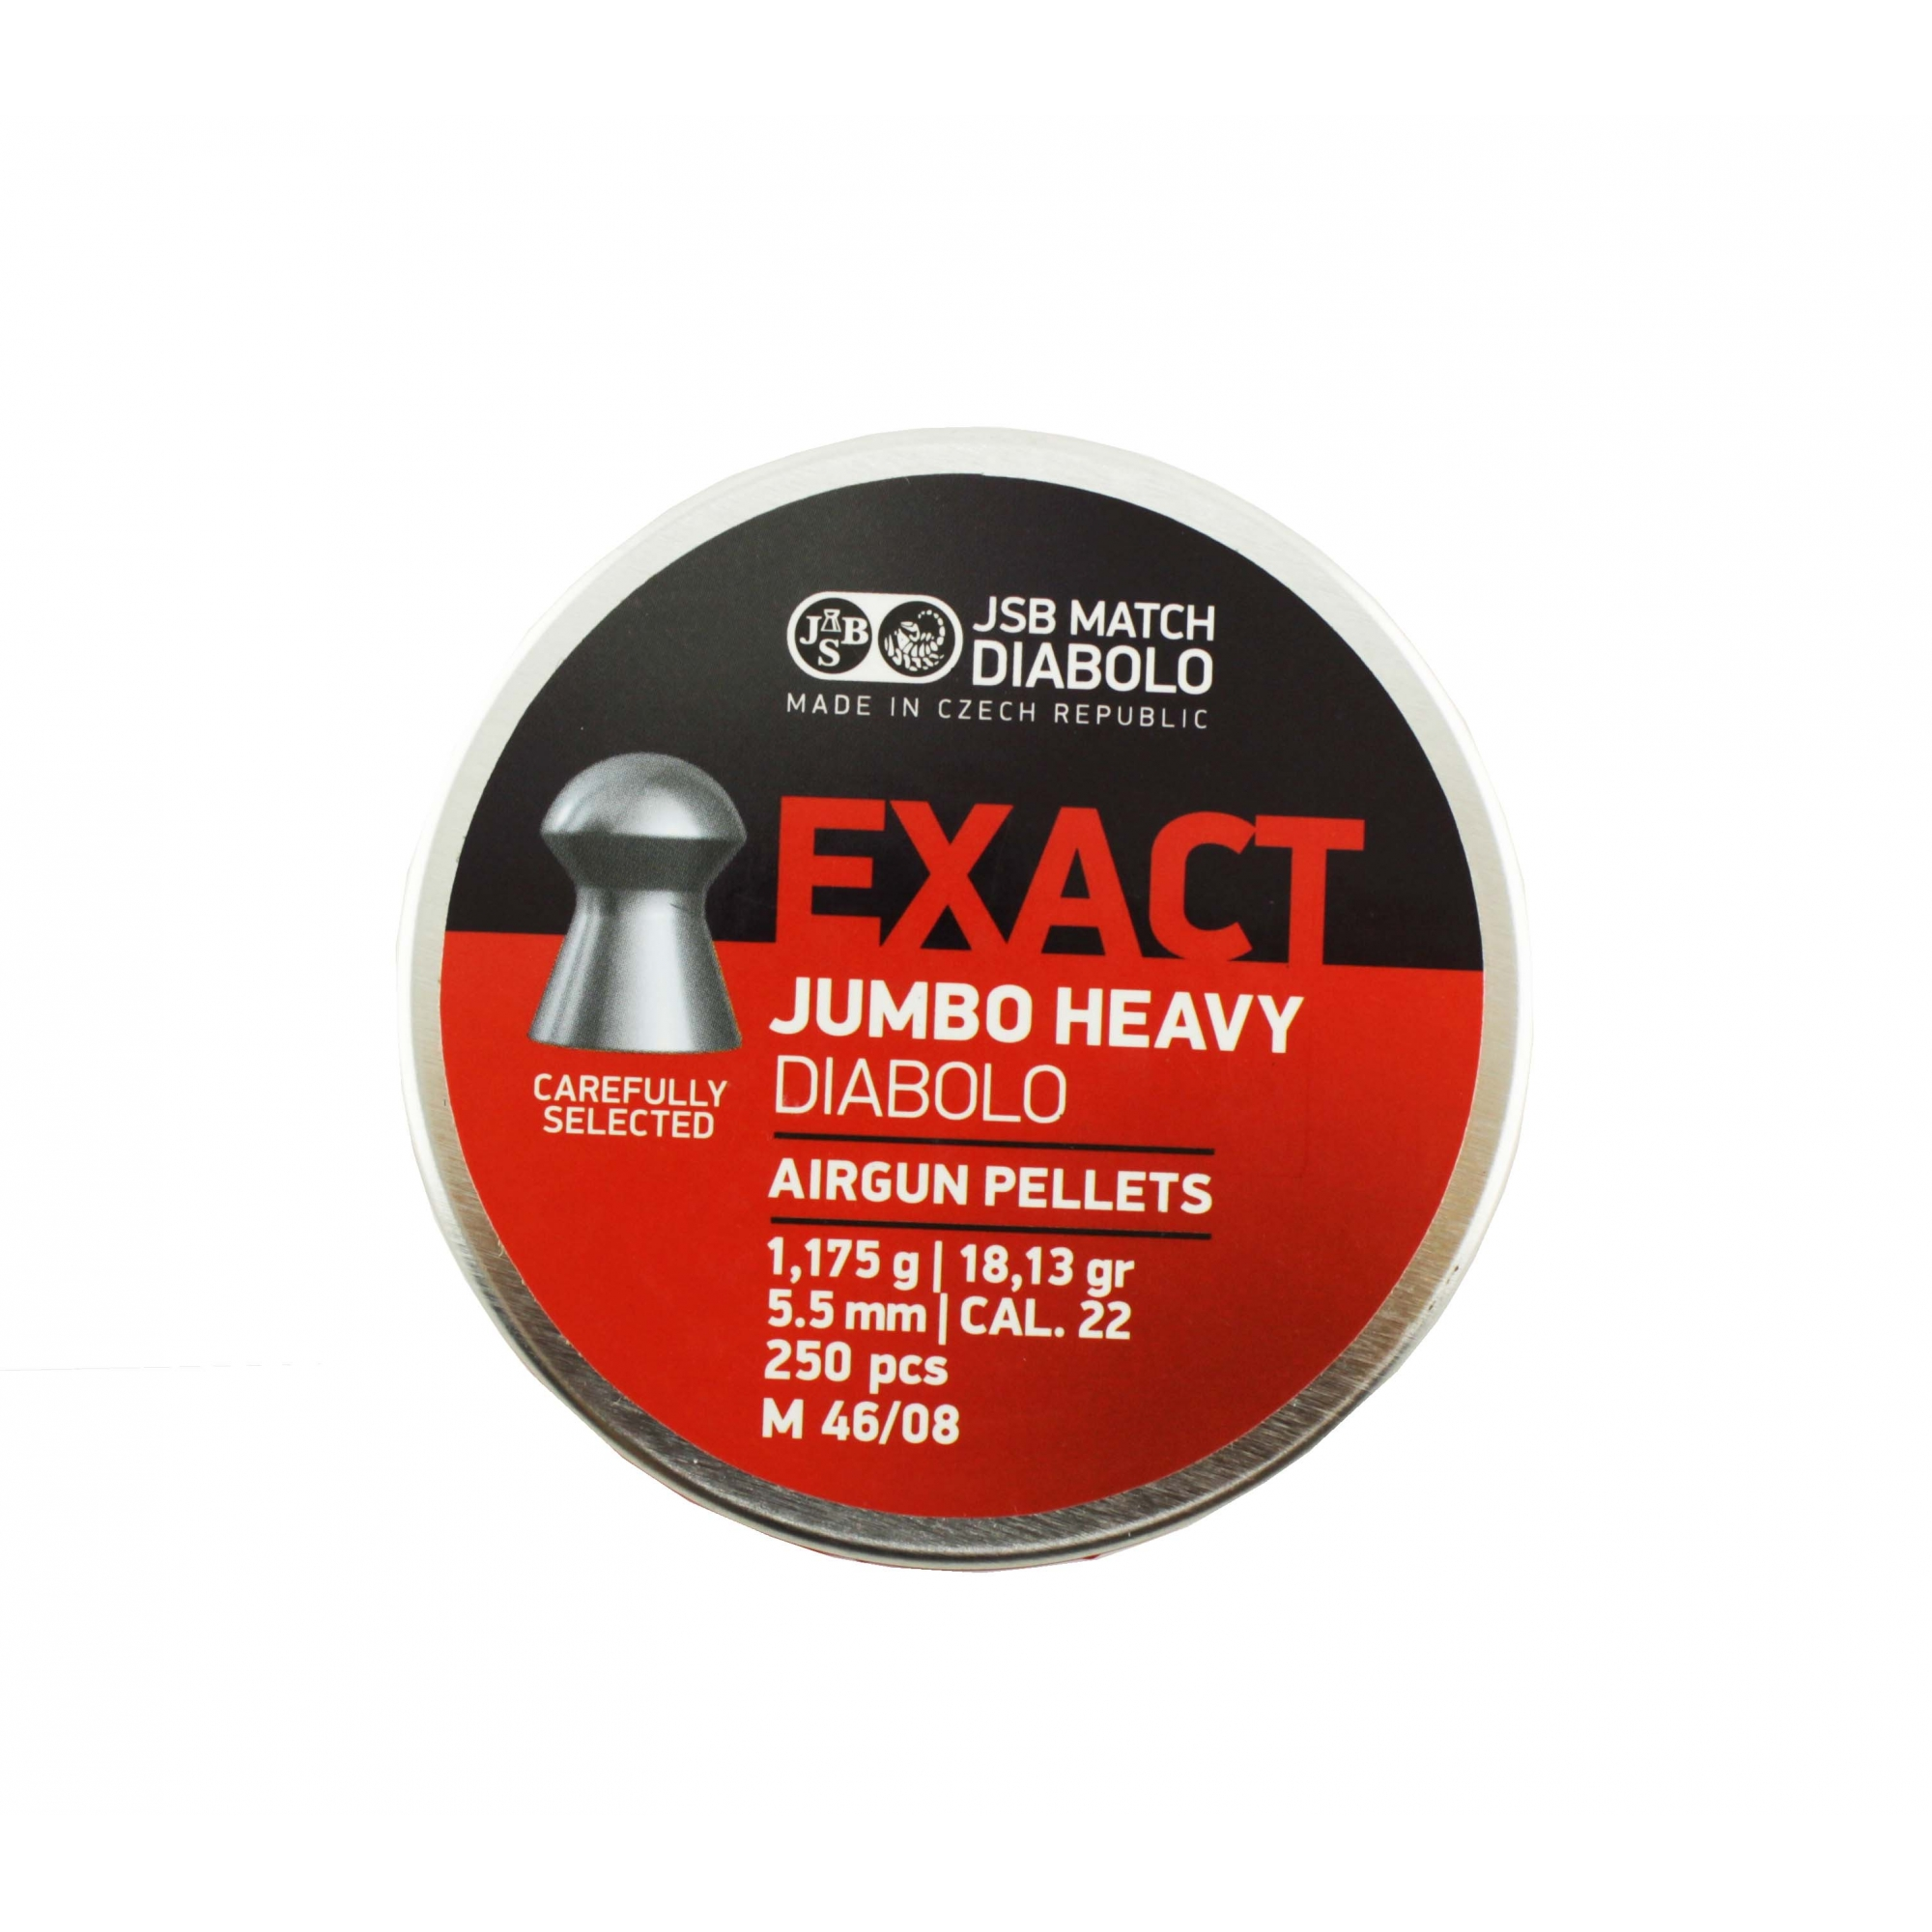 Chumbinho JSB Exact Jumbo Heavy Diabolo 5,5mm 250 Und.